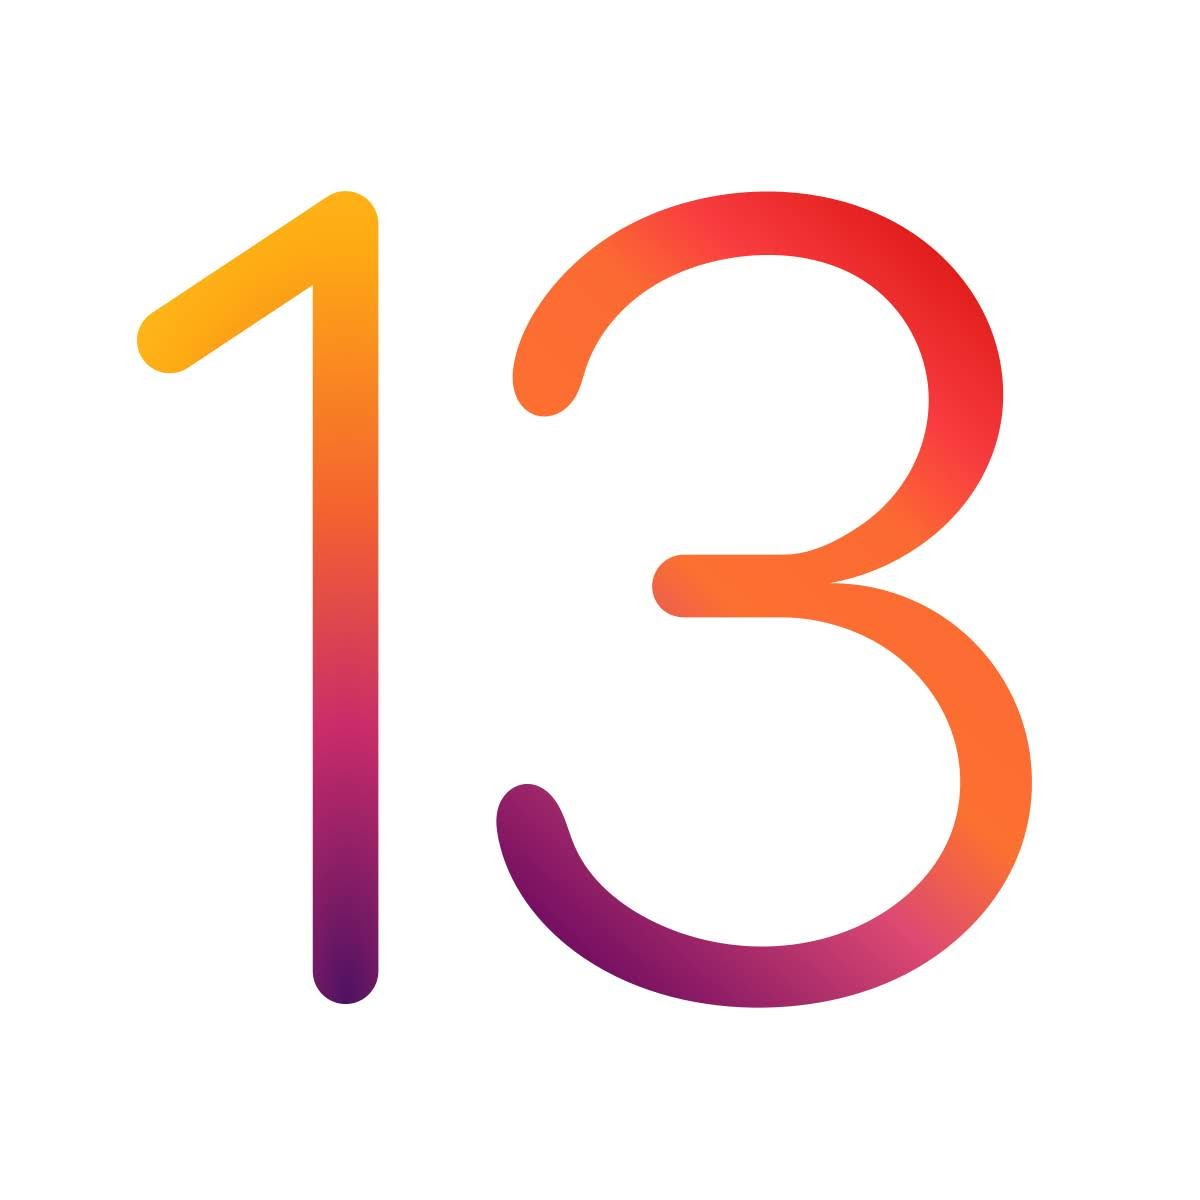 iOS13.2とiPadOS 13.2 Public Beta3が利用可能にの画像